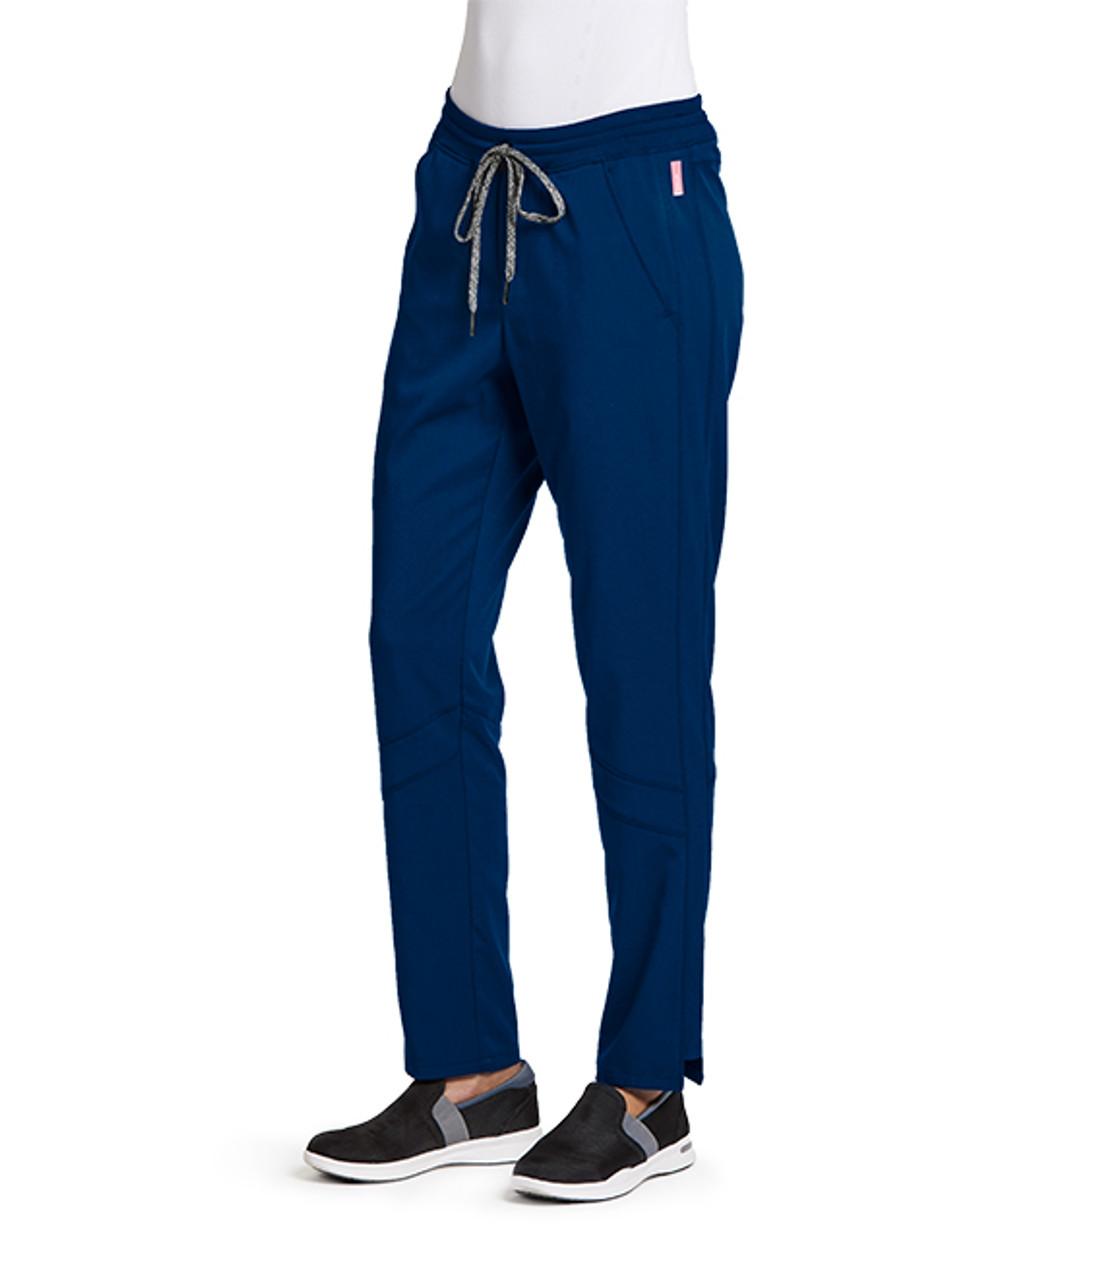 (GVSP509) Grey's Anatomy Active Stretch 3 Pocket Knit Waist Midrise Cargo Scrub Pant